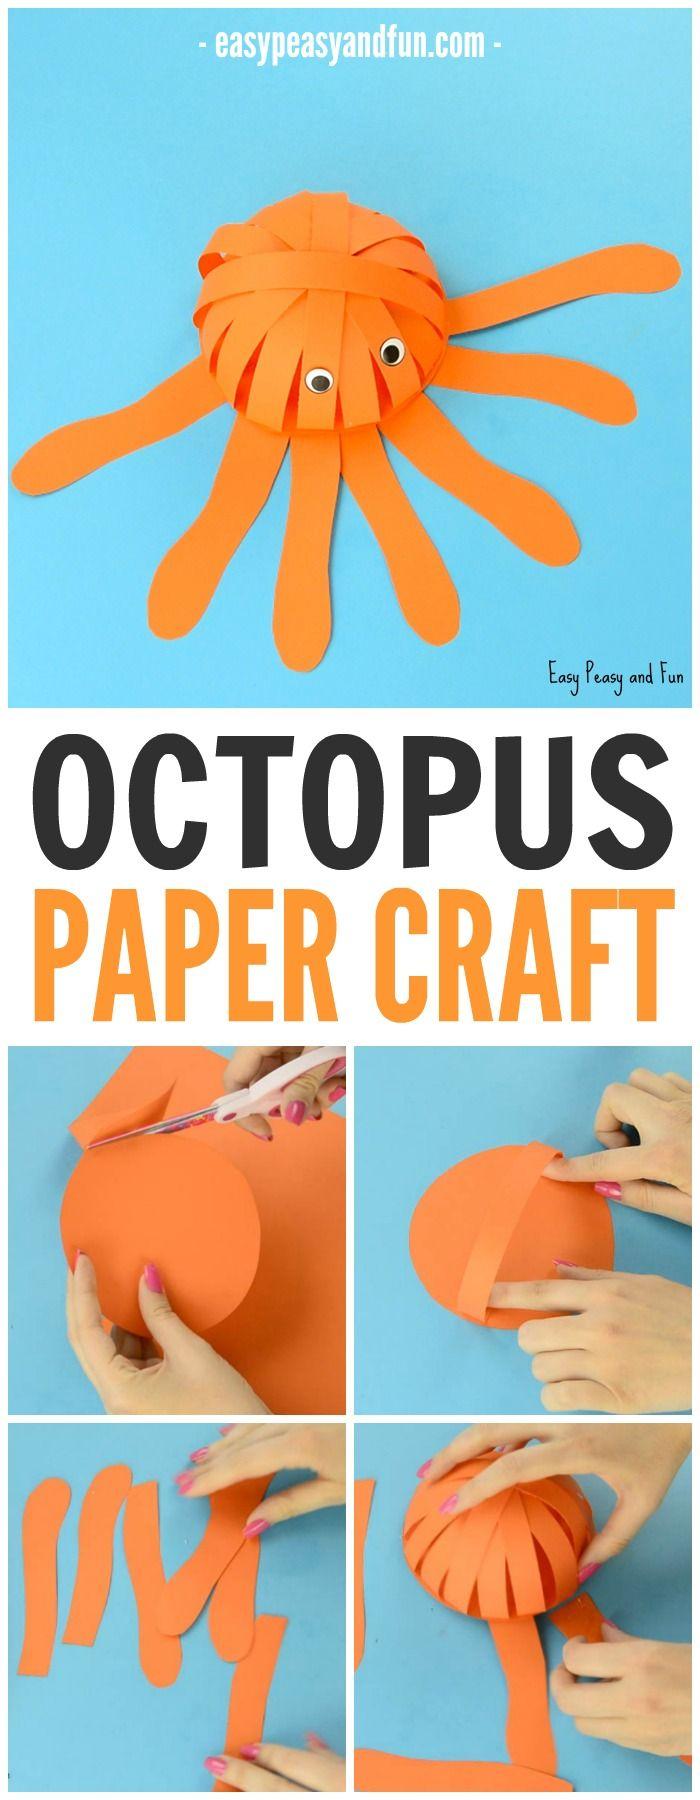 best 25 octopus crafts ideas on pinterest ocean crafts paper